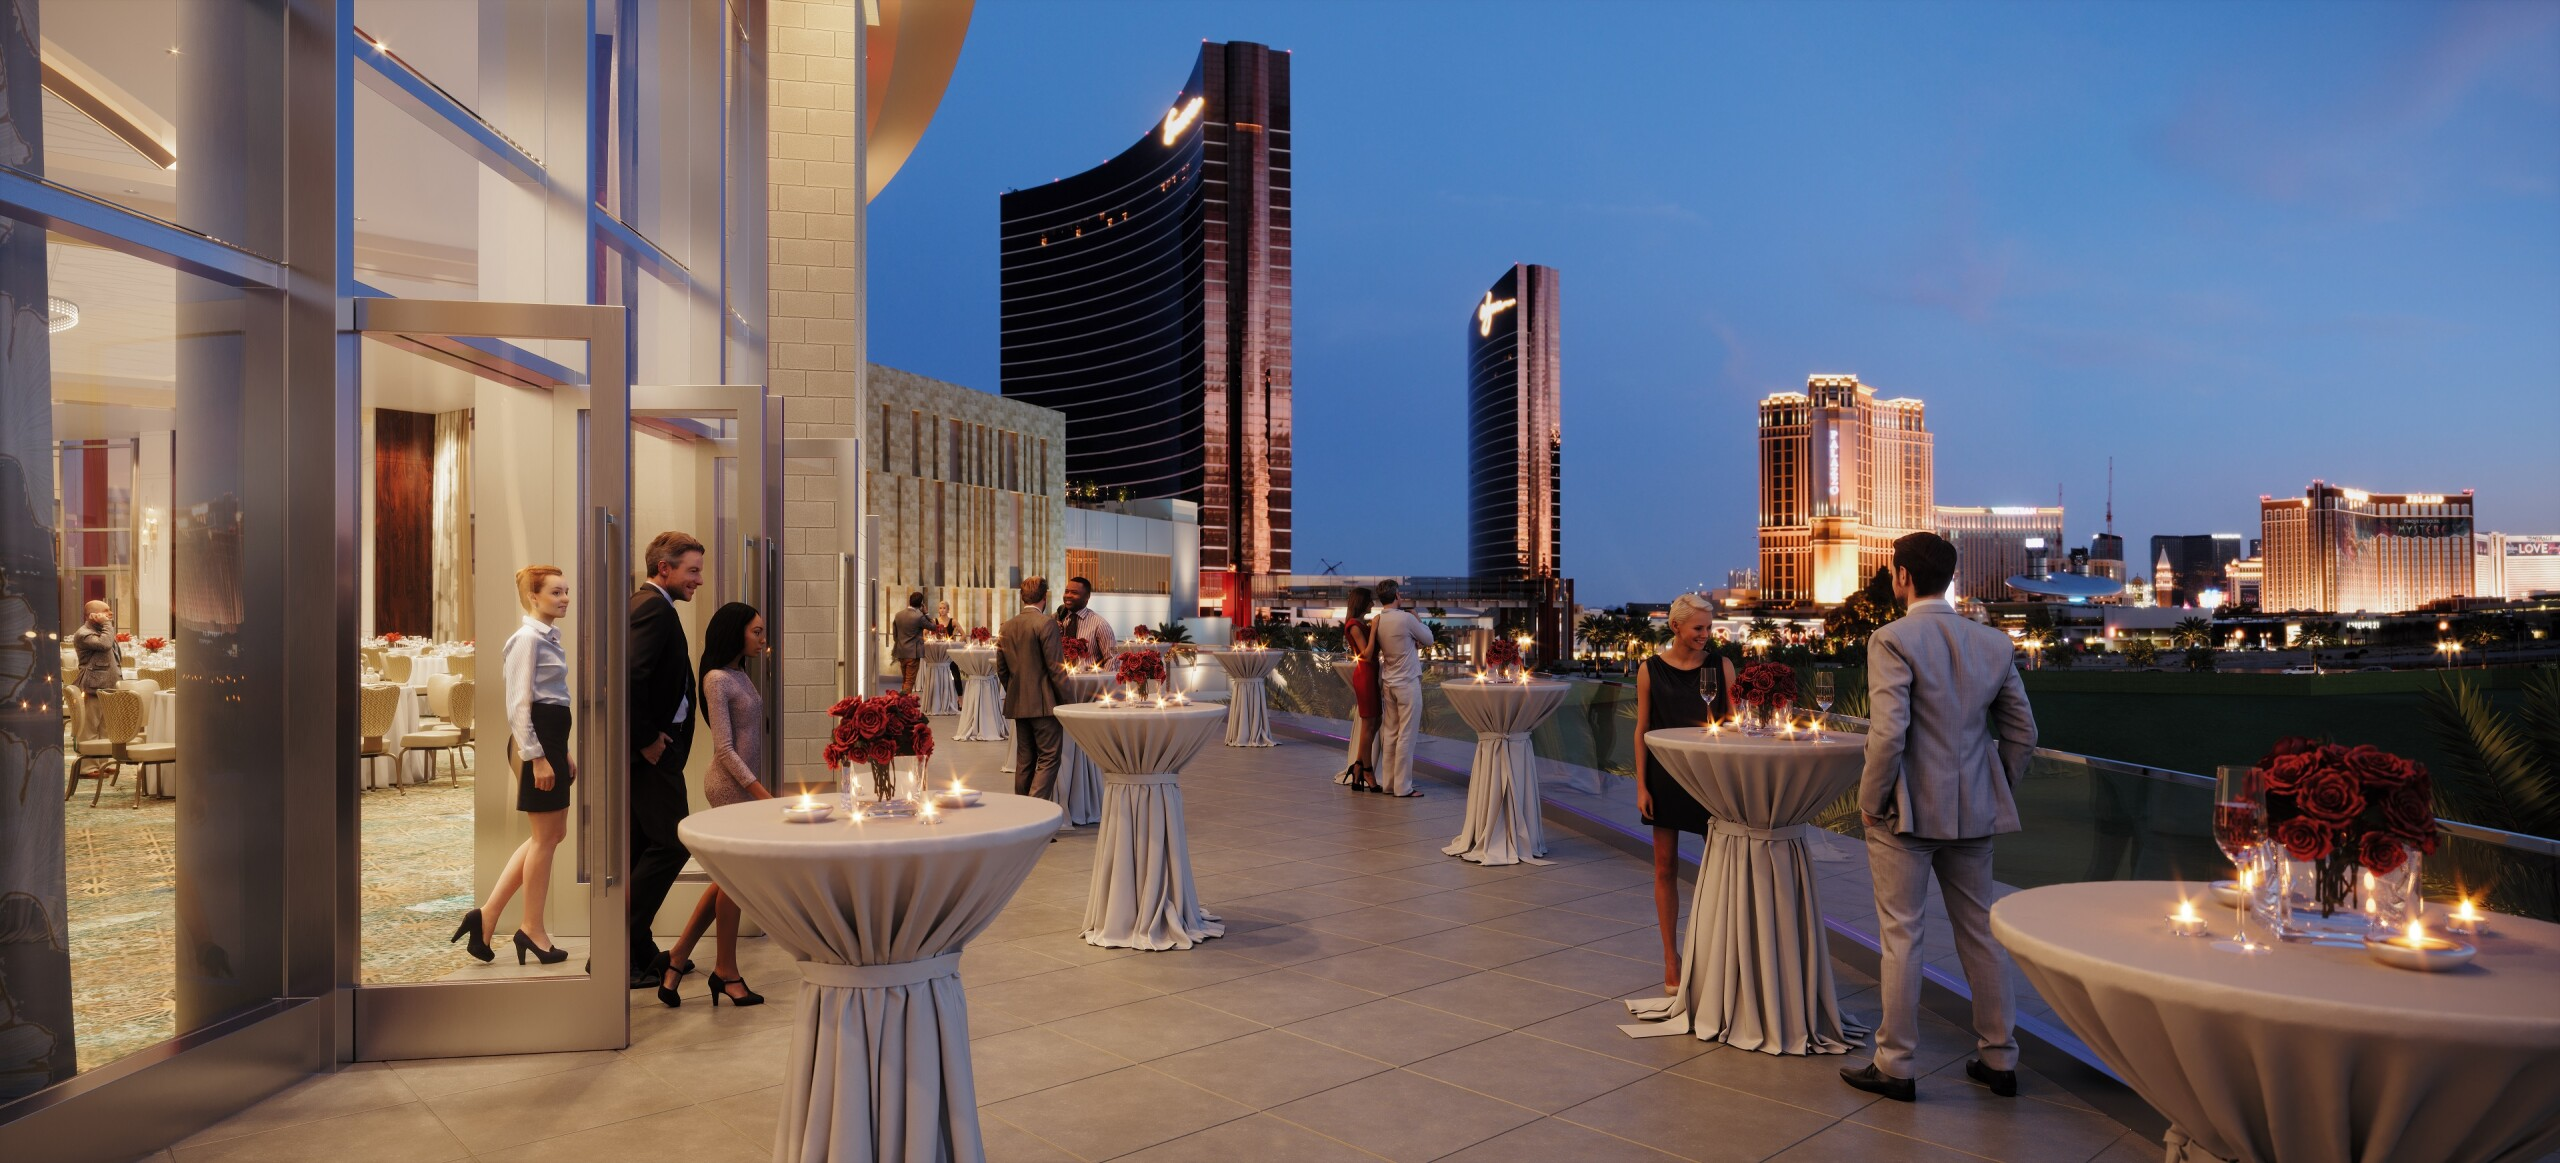 Resorts World Las Vegas - Lily Terrace Rendering.jpg